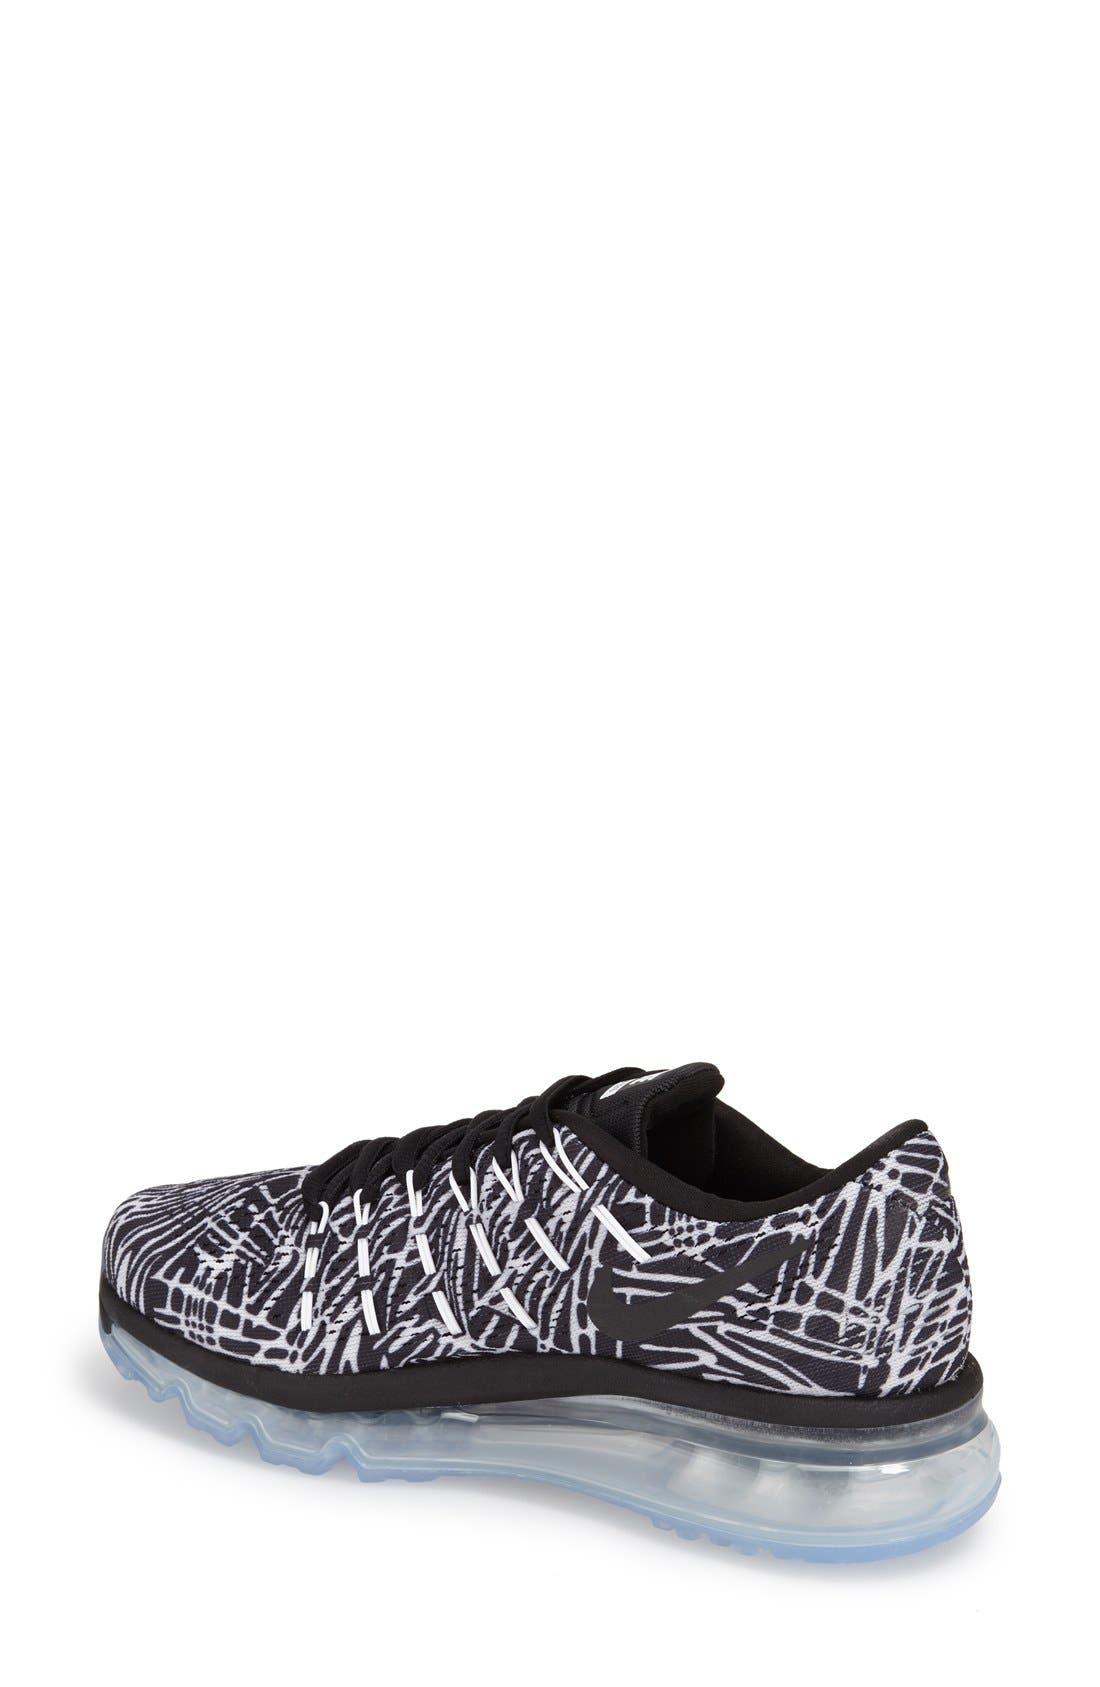 Alternate Image 2  - Nike 'Air Max 2016' Running Shoe (Women)